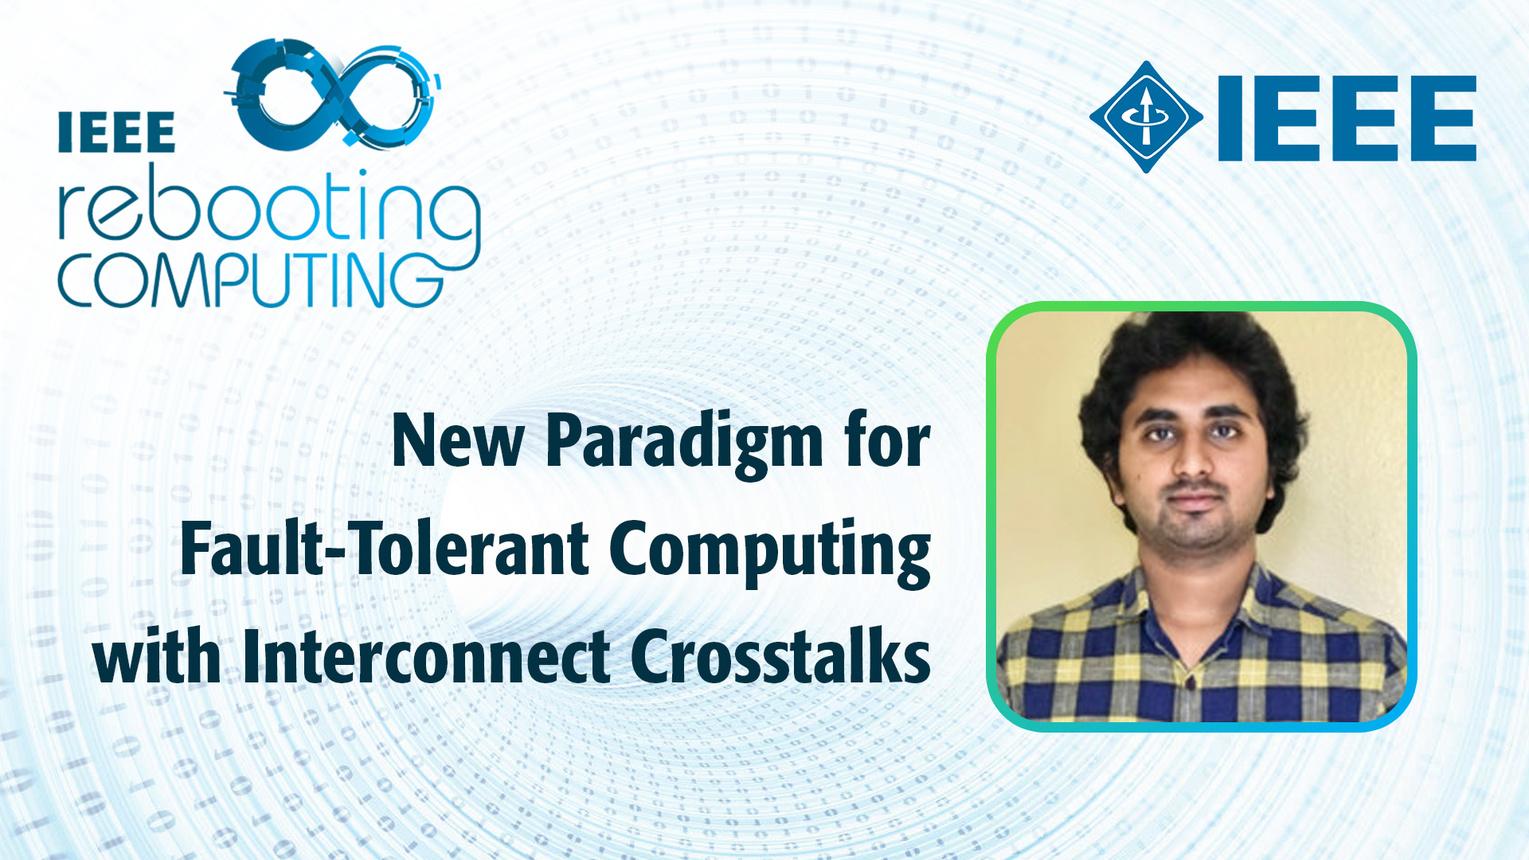 New Paradigm for Fault-Tolerant Computing with Interconnect Crosstalks - Naveen Kumar Macha - ICRC 2018